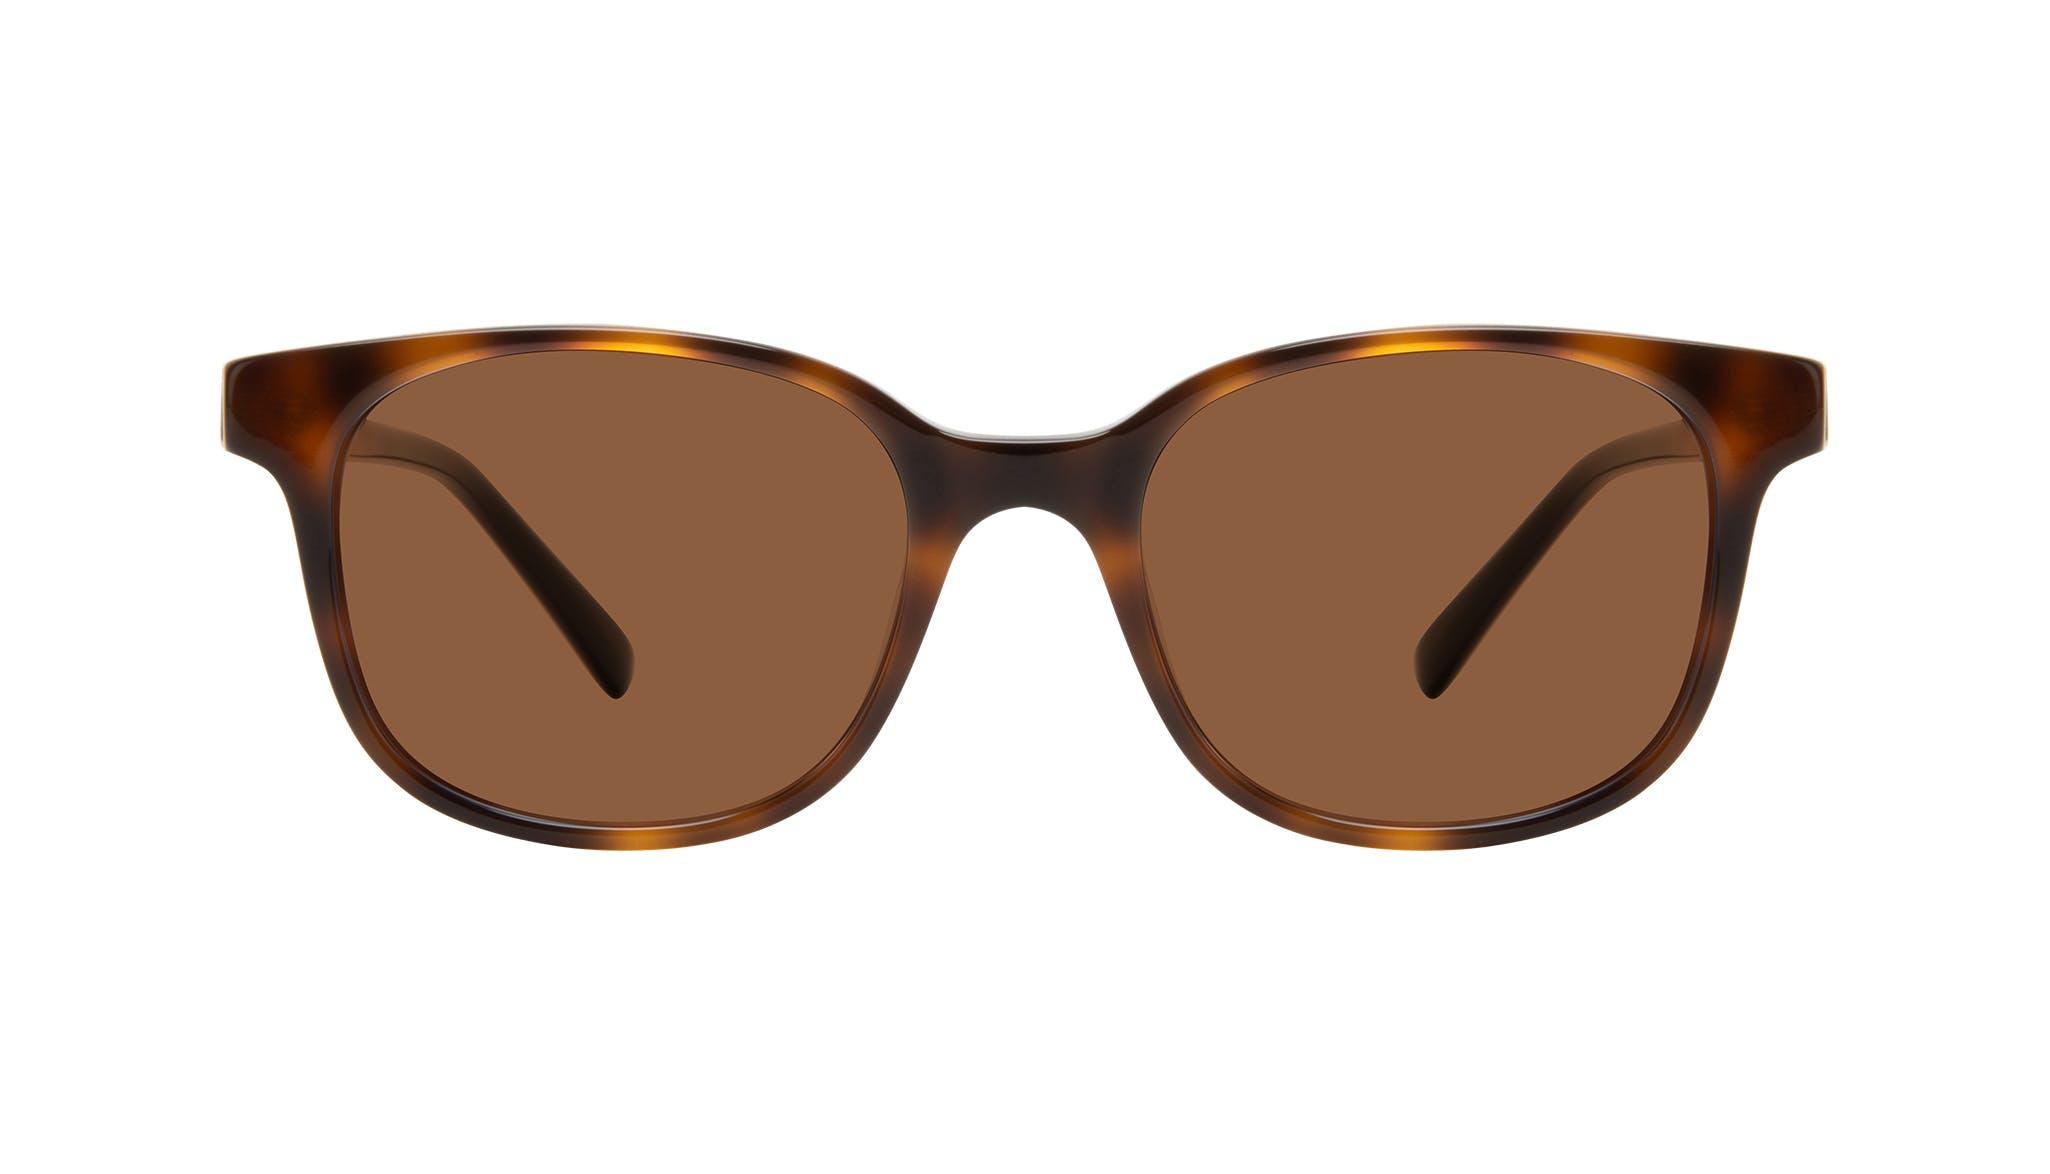 Affordable Fashion Glasses Square Sunglasses Women Unique Tortoise Front